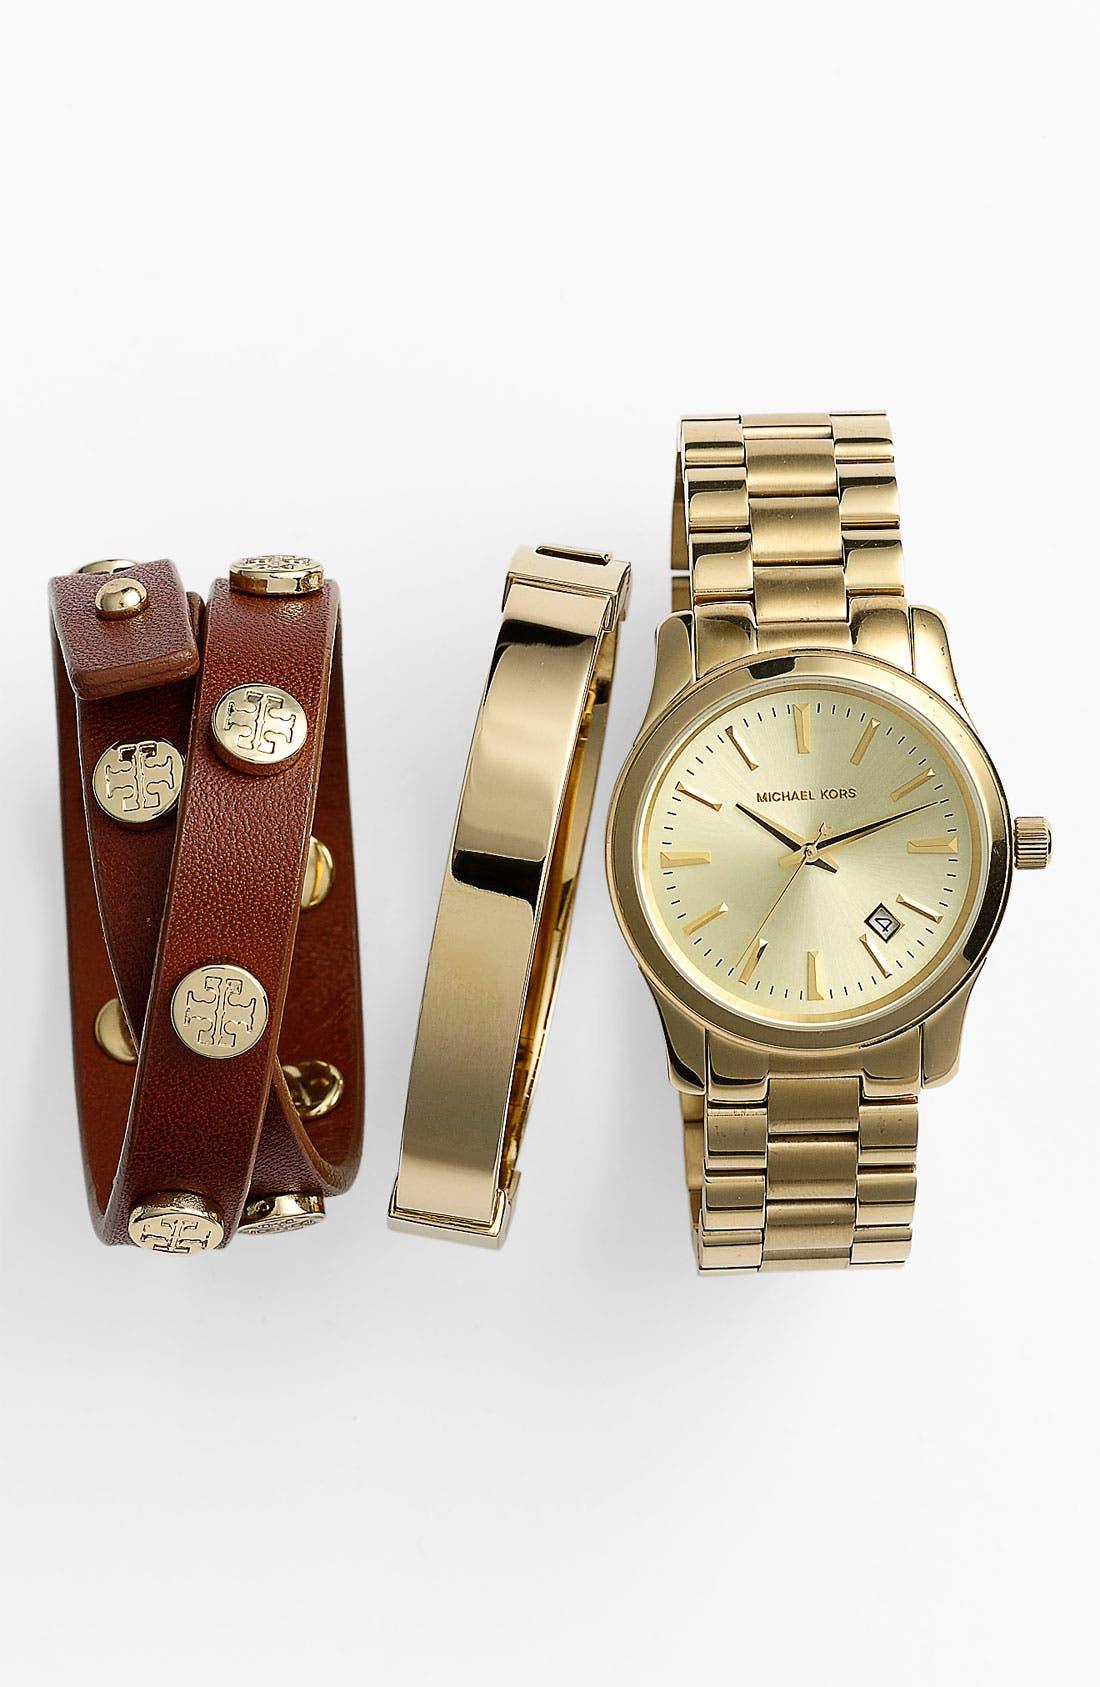 Main Image - Michael Kors Watch & Tory Burch Bracelet